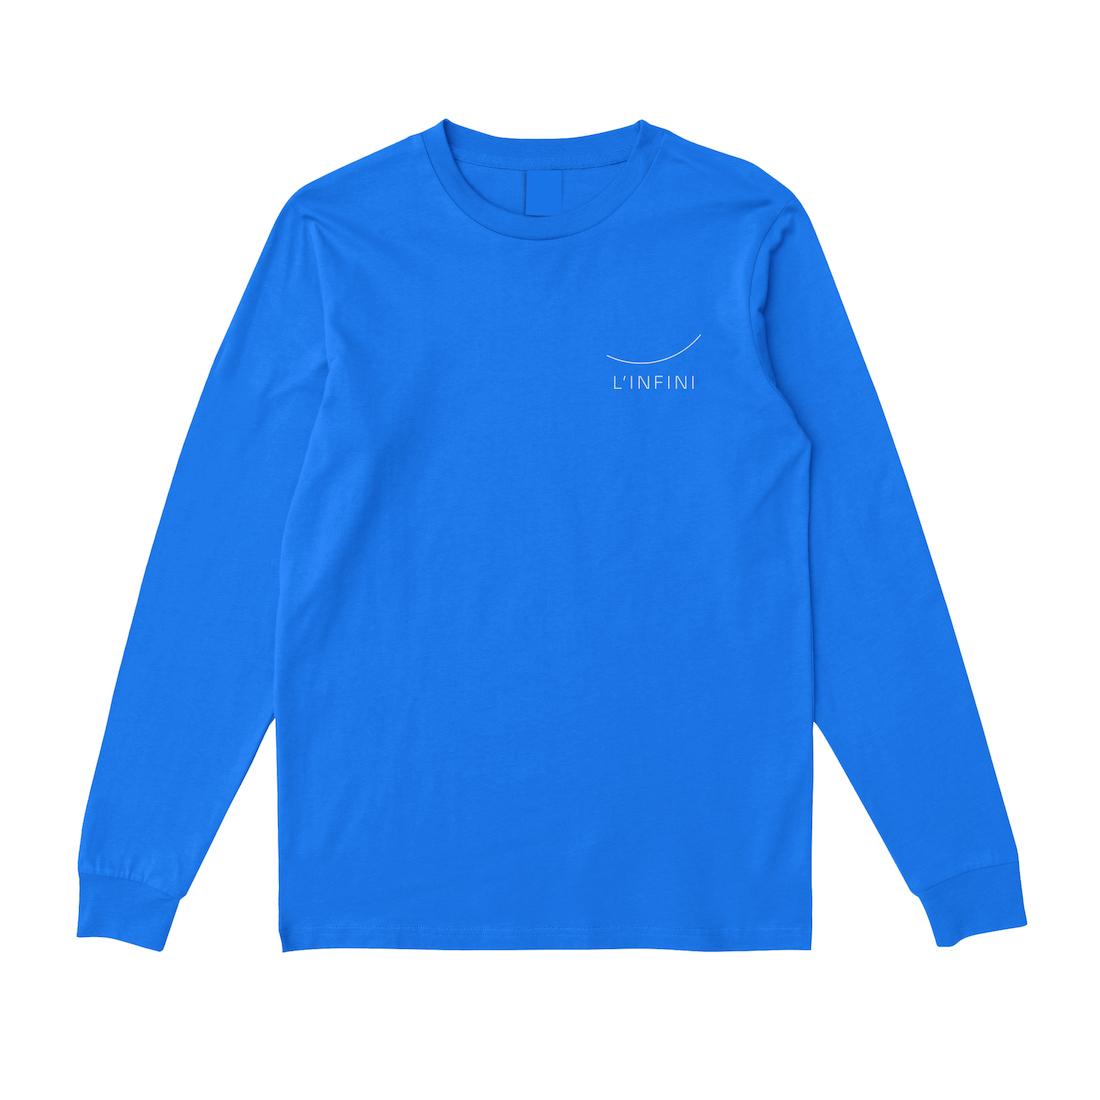 PHI Infinite Long Sleeves Bleu FR1